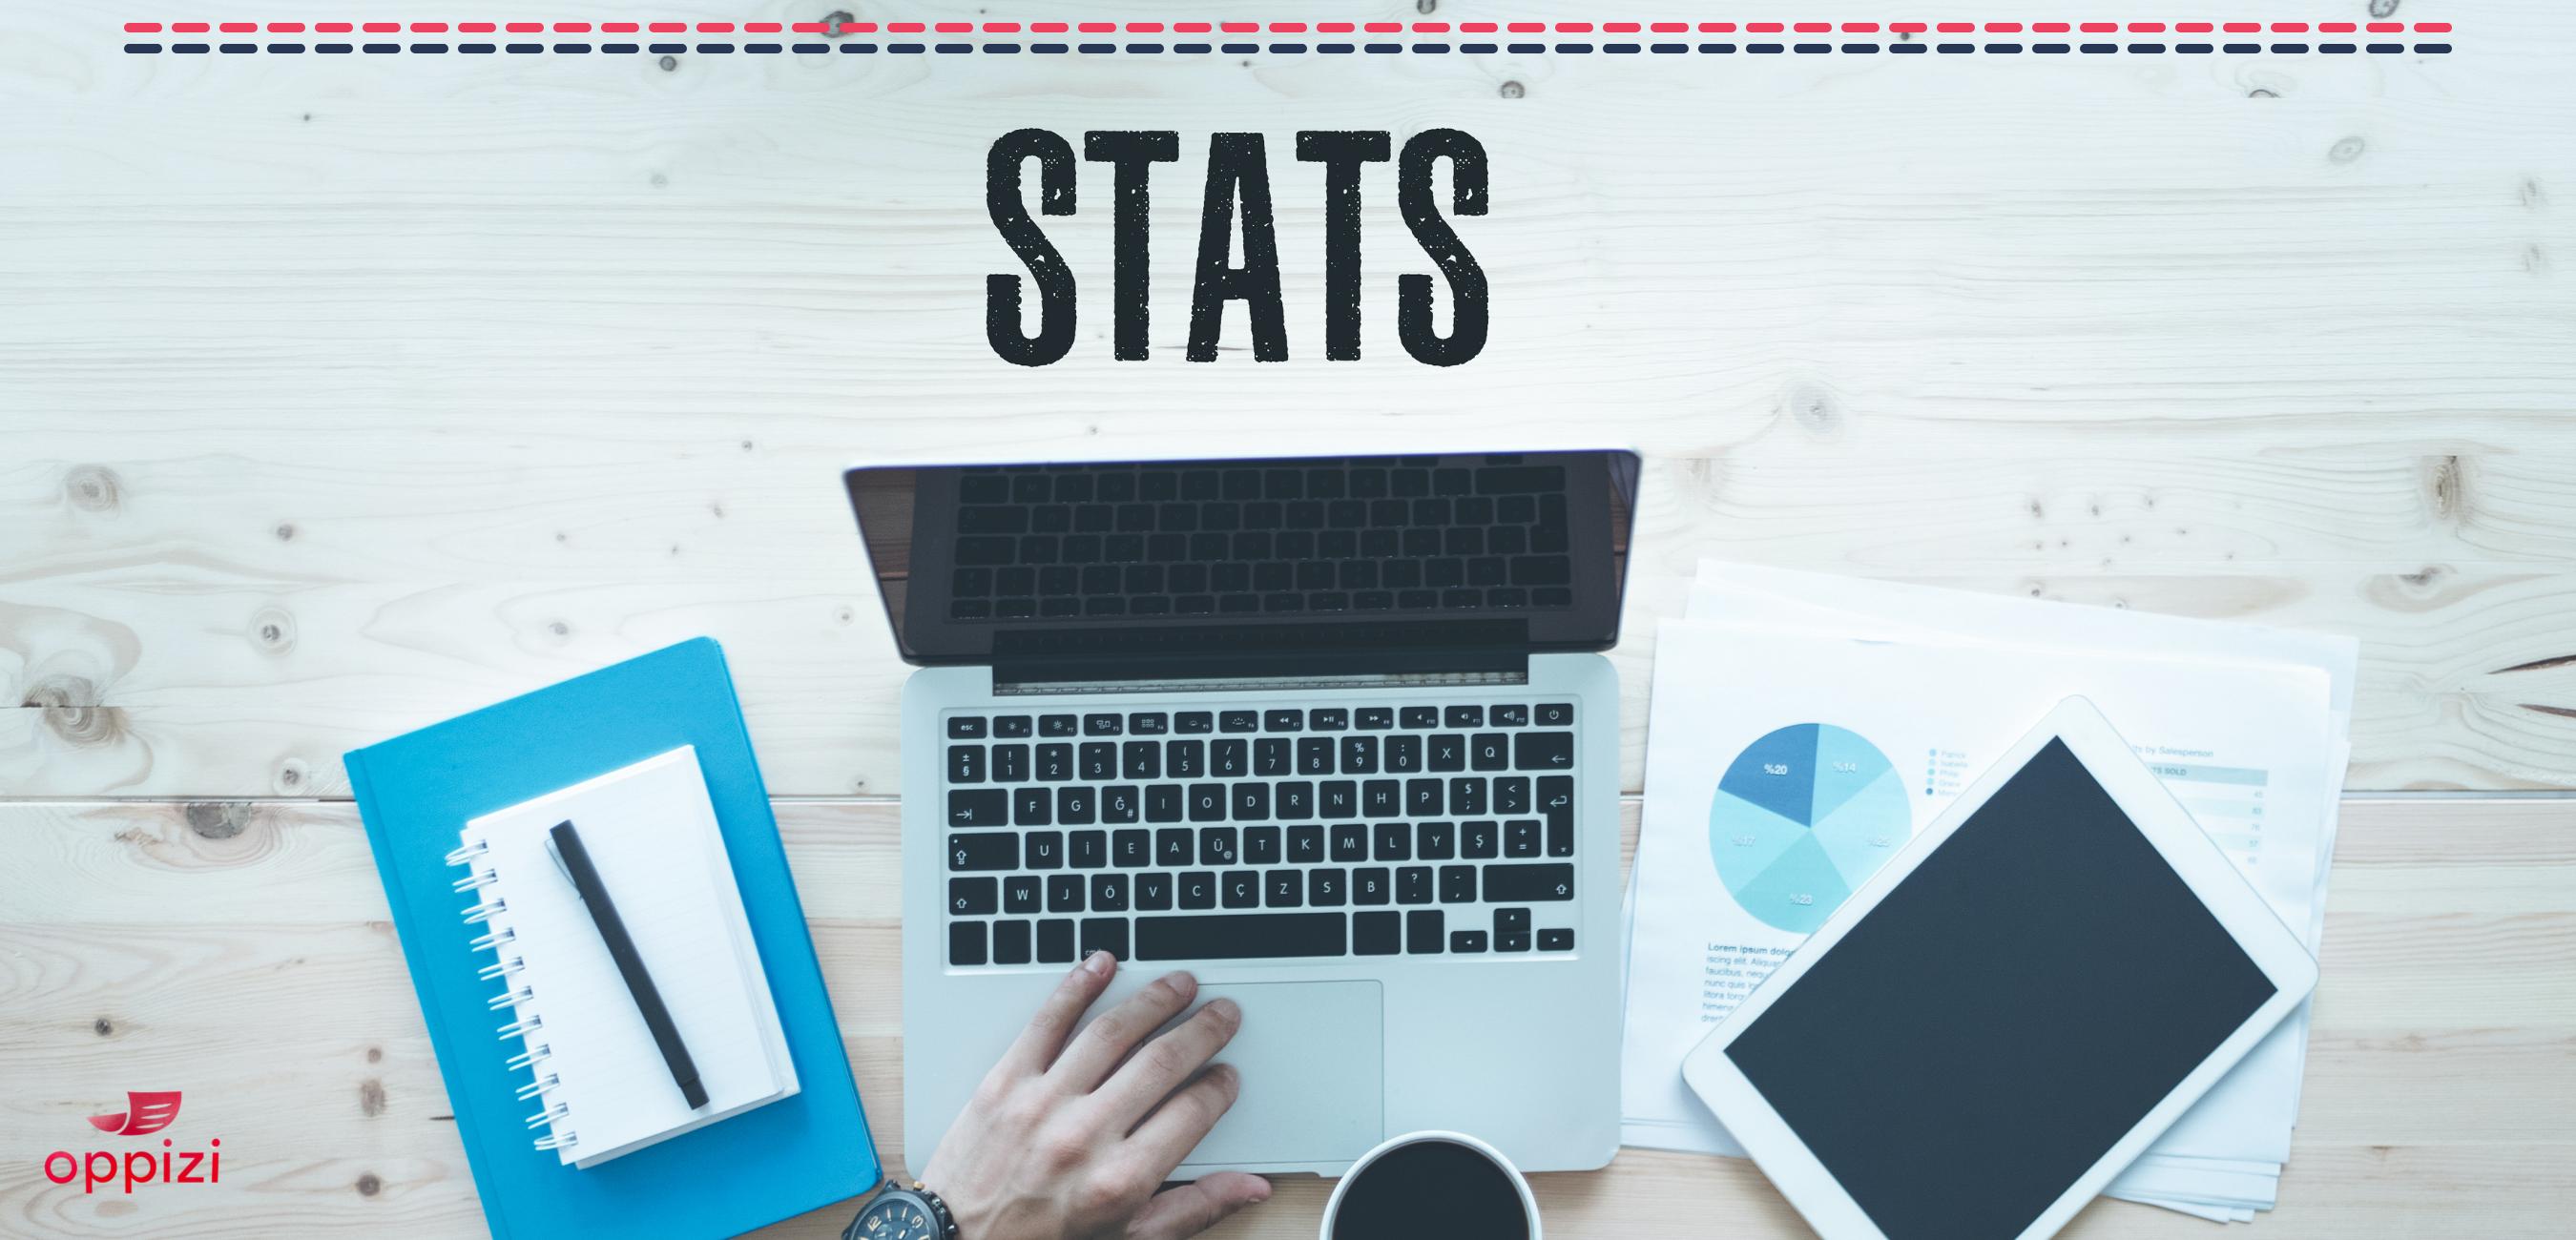 3 statistics to help you focus your offline marketing efforts